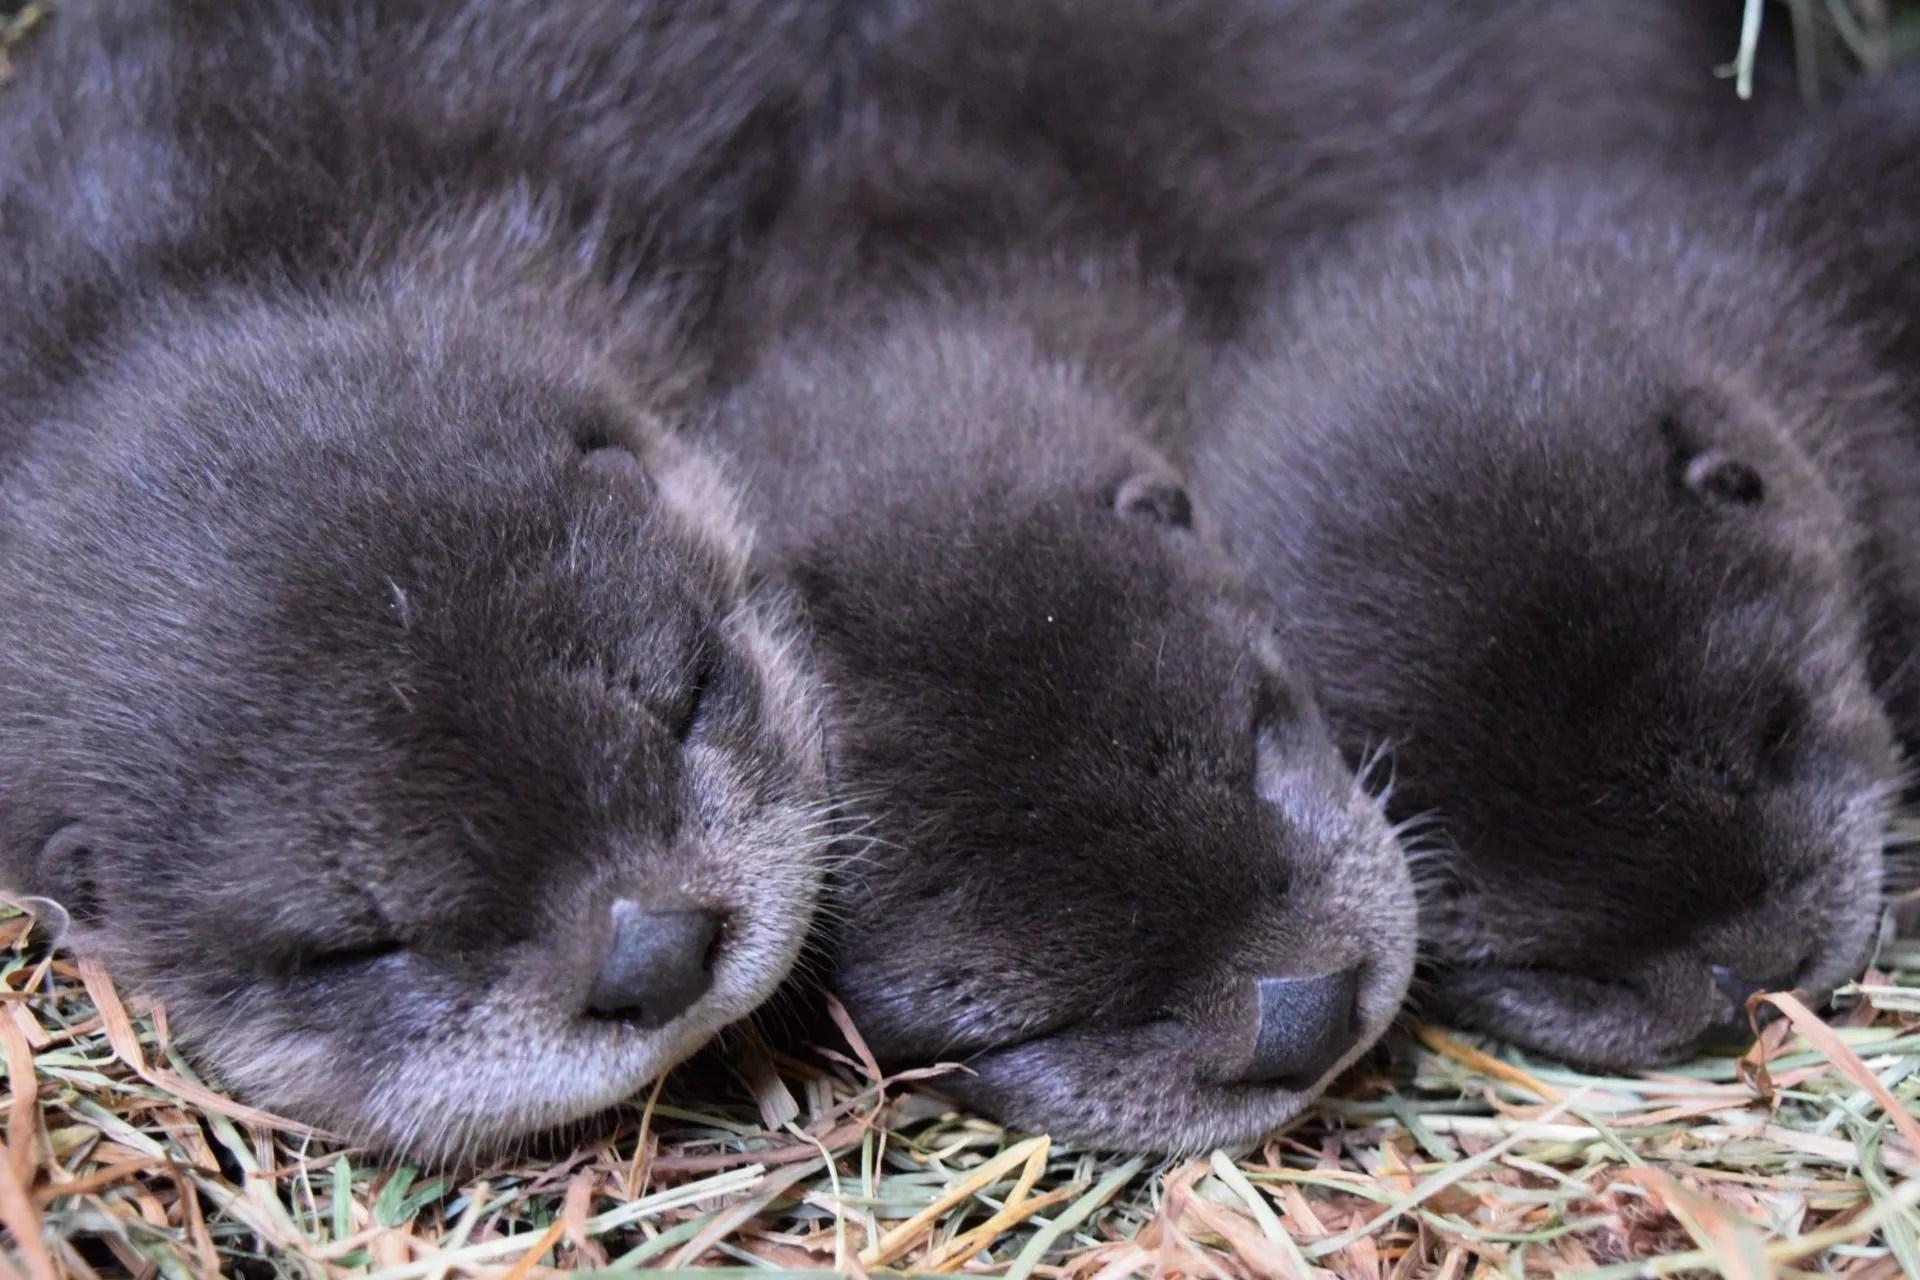 Meet Buttonwood Park Zoos 3 New Furry Adorable Otter Babies Buttonwood Park Zoo